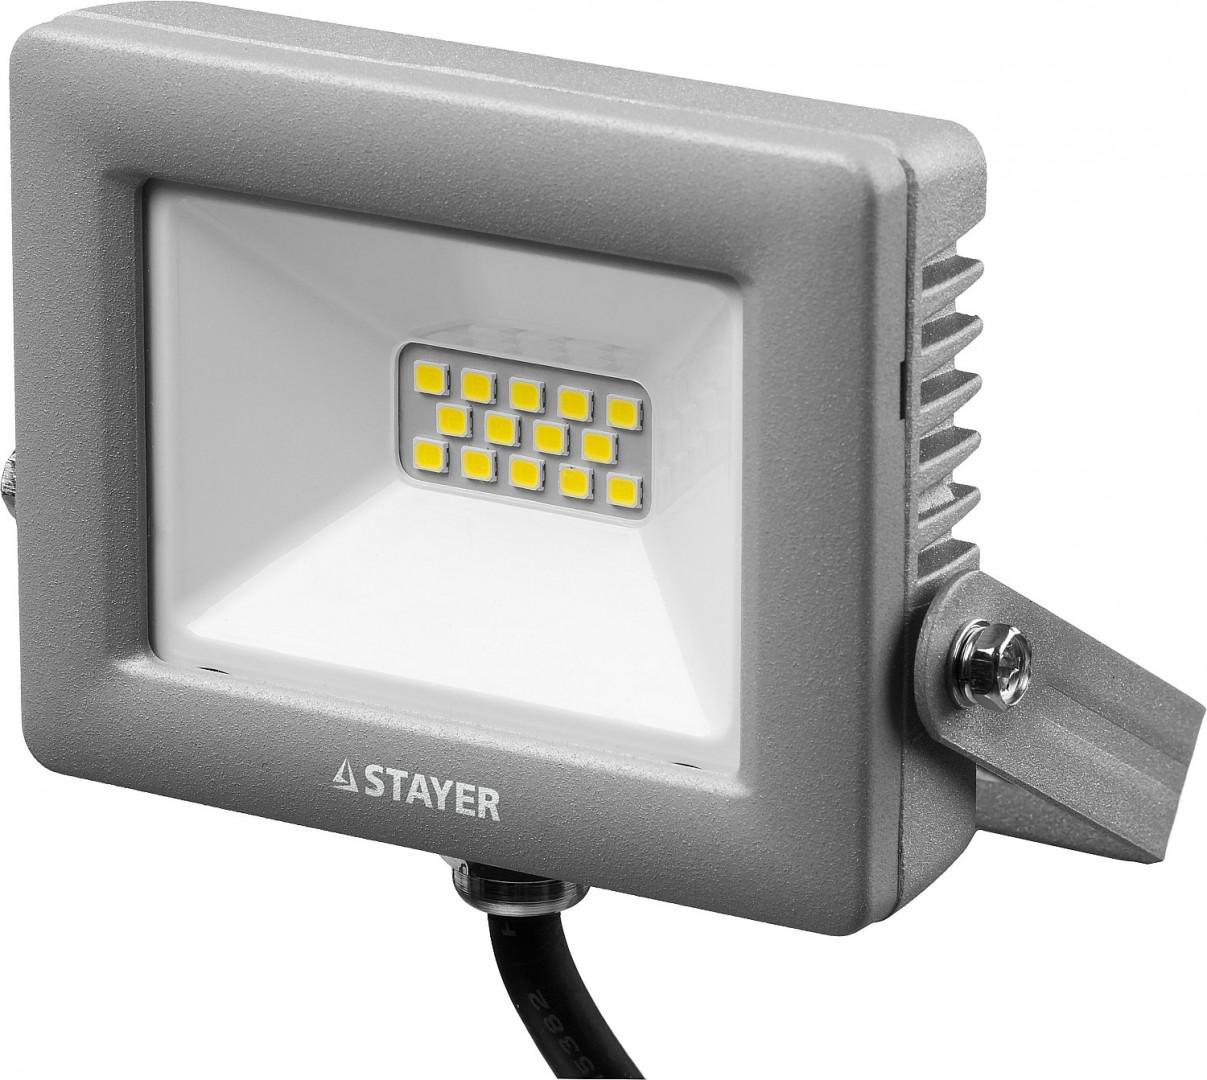 Прожектор Stayer Profi 57131-50 цена и фото